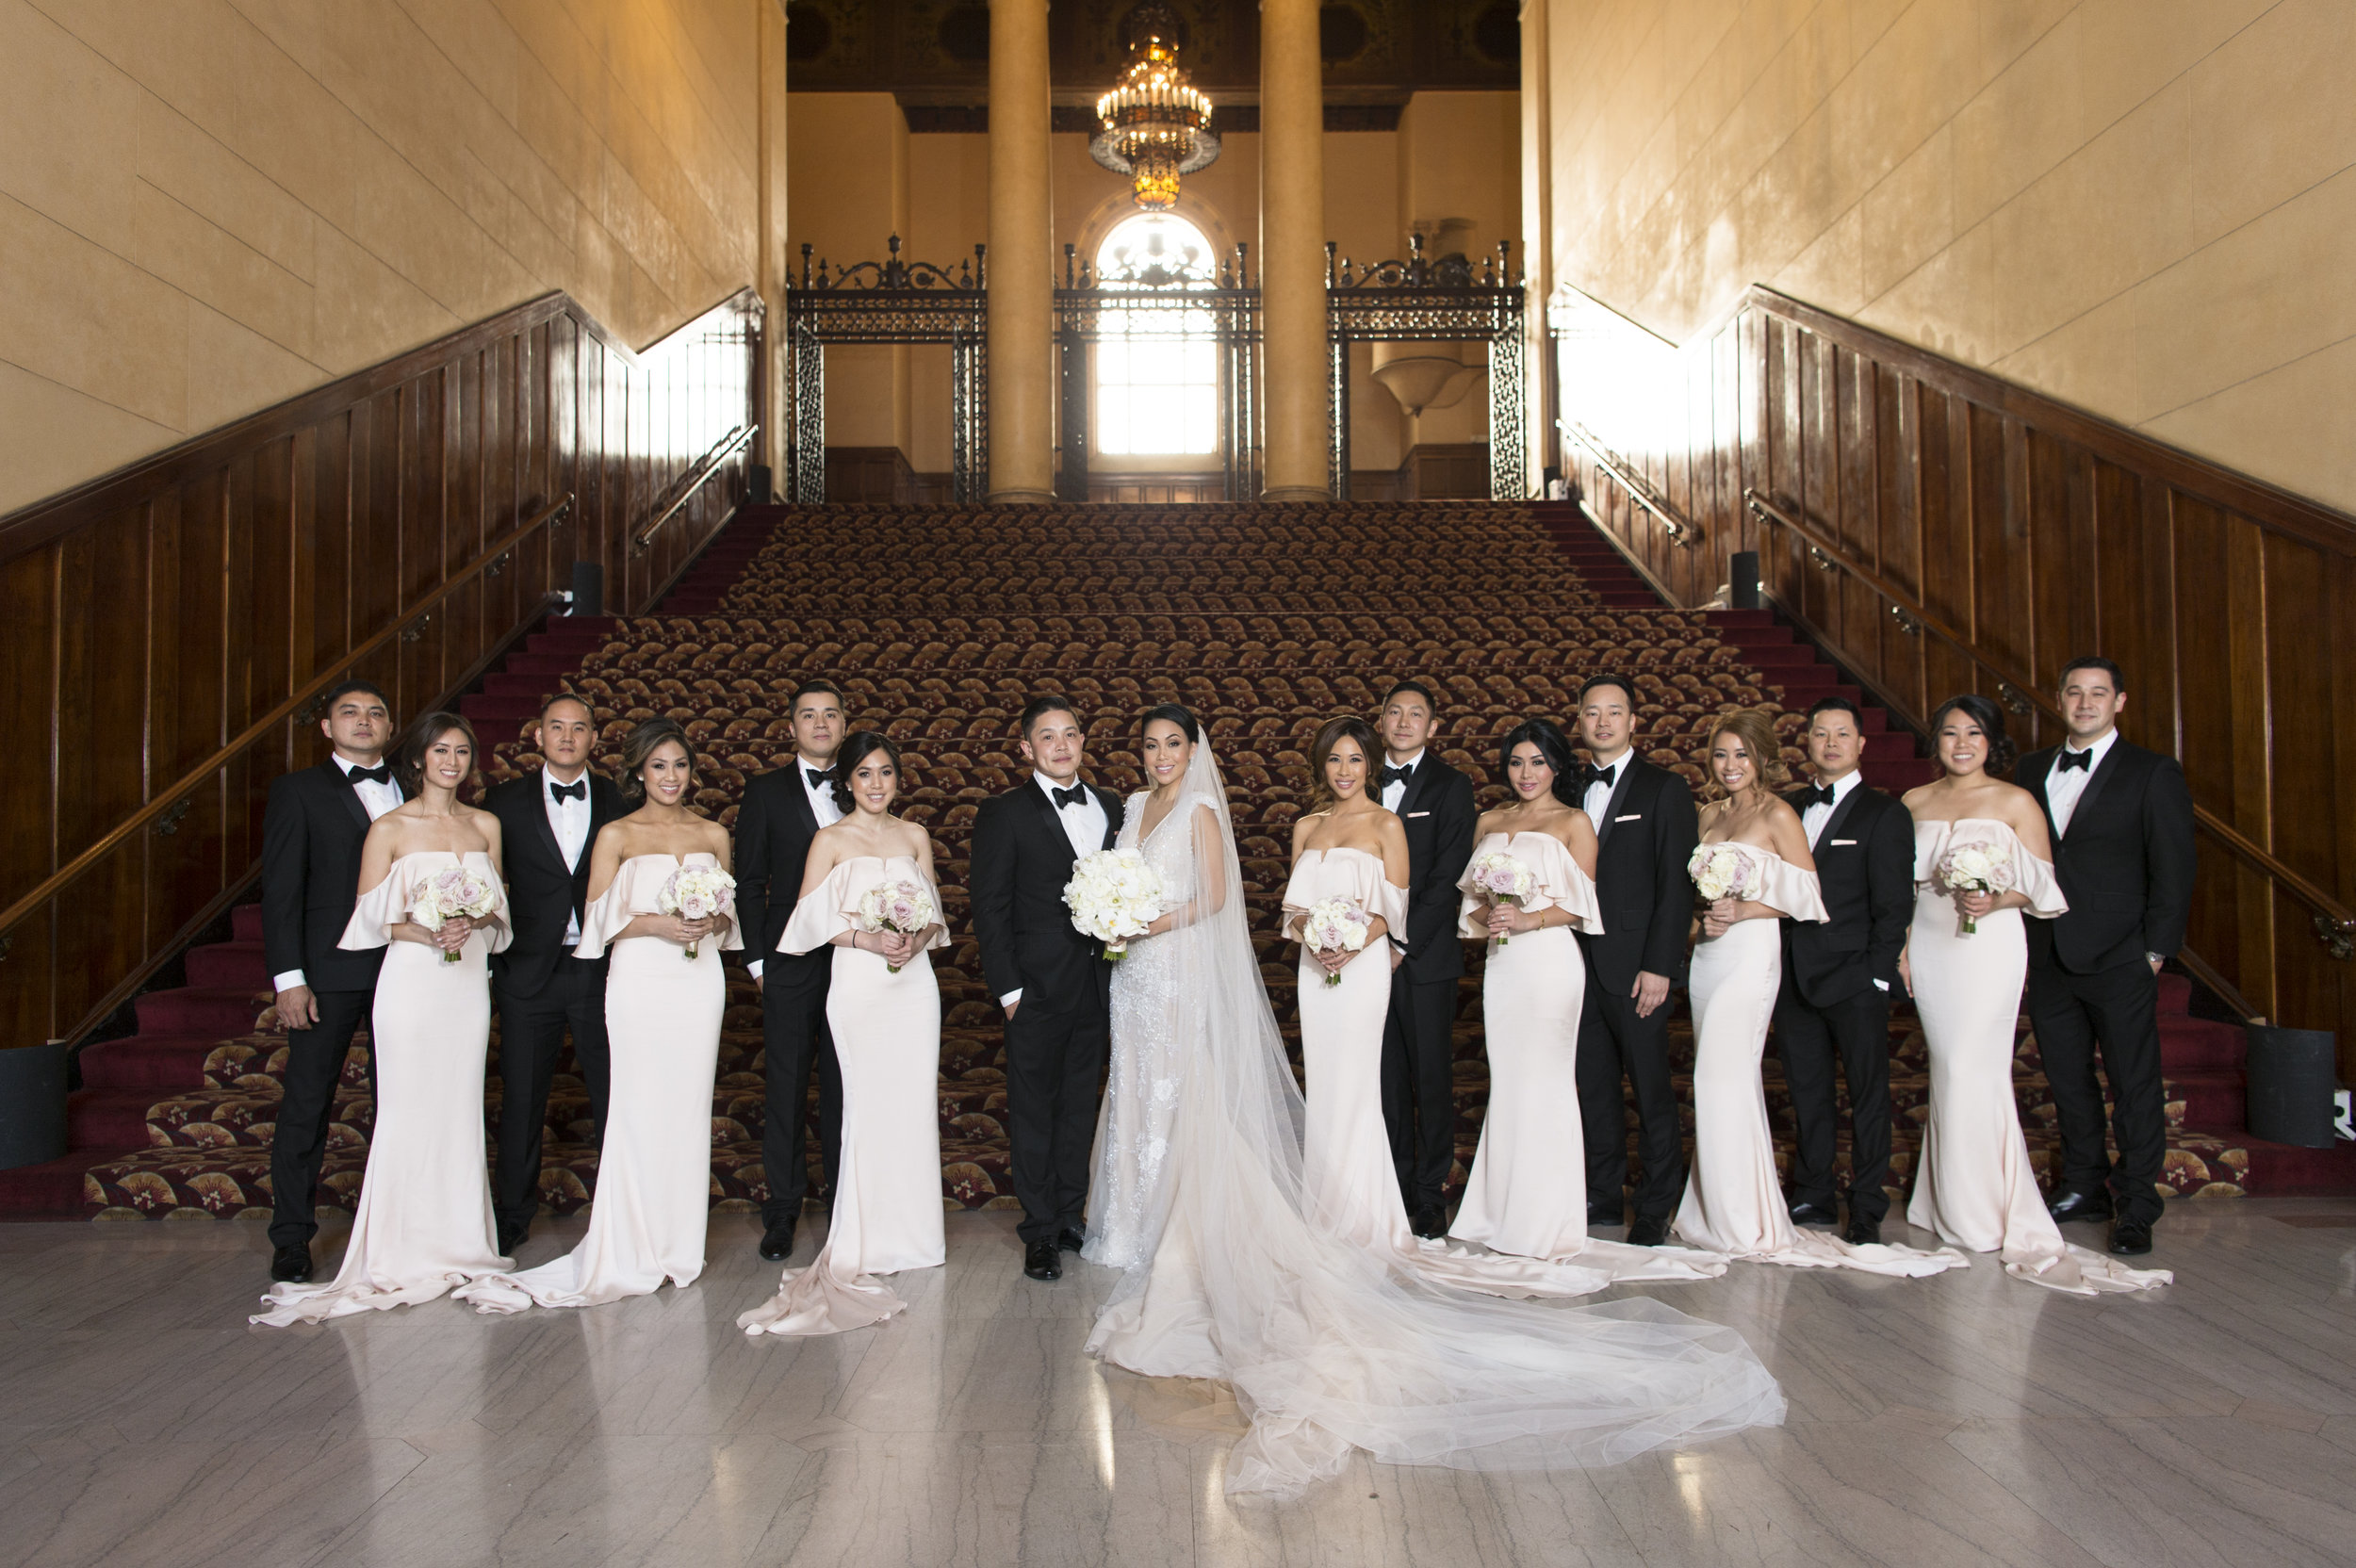 LA-PARK-PLAZA-WEDDING.jpg